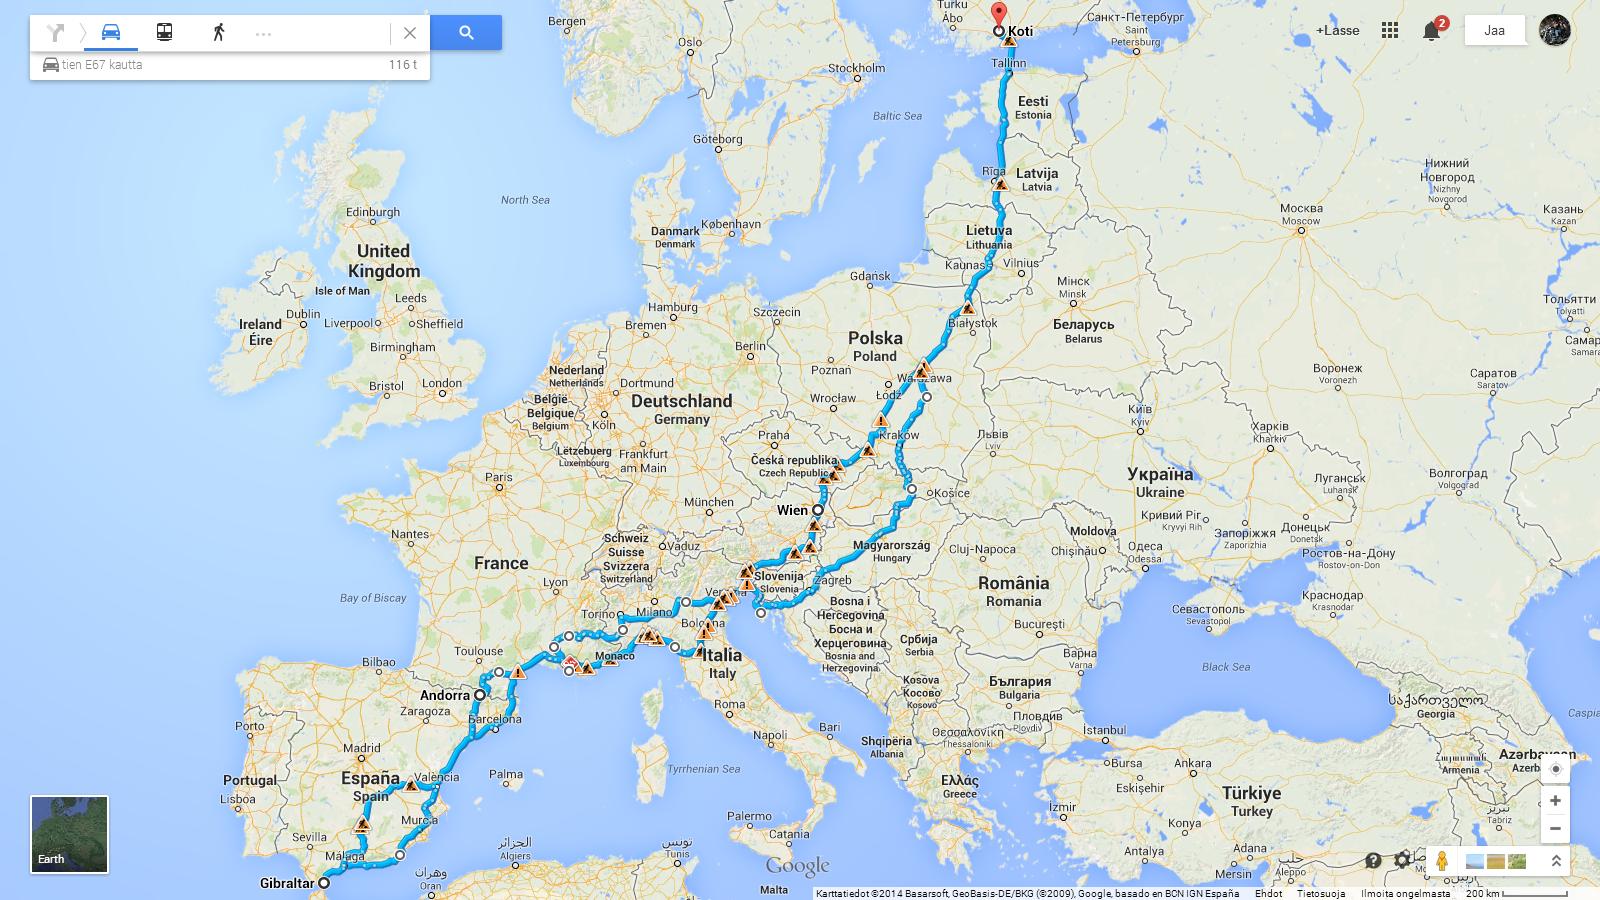 Finland-Gibraltar-Finland 2014 (22 Days and 10 000 km)